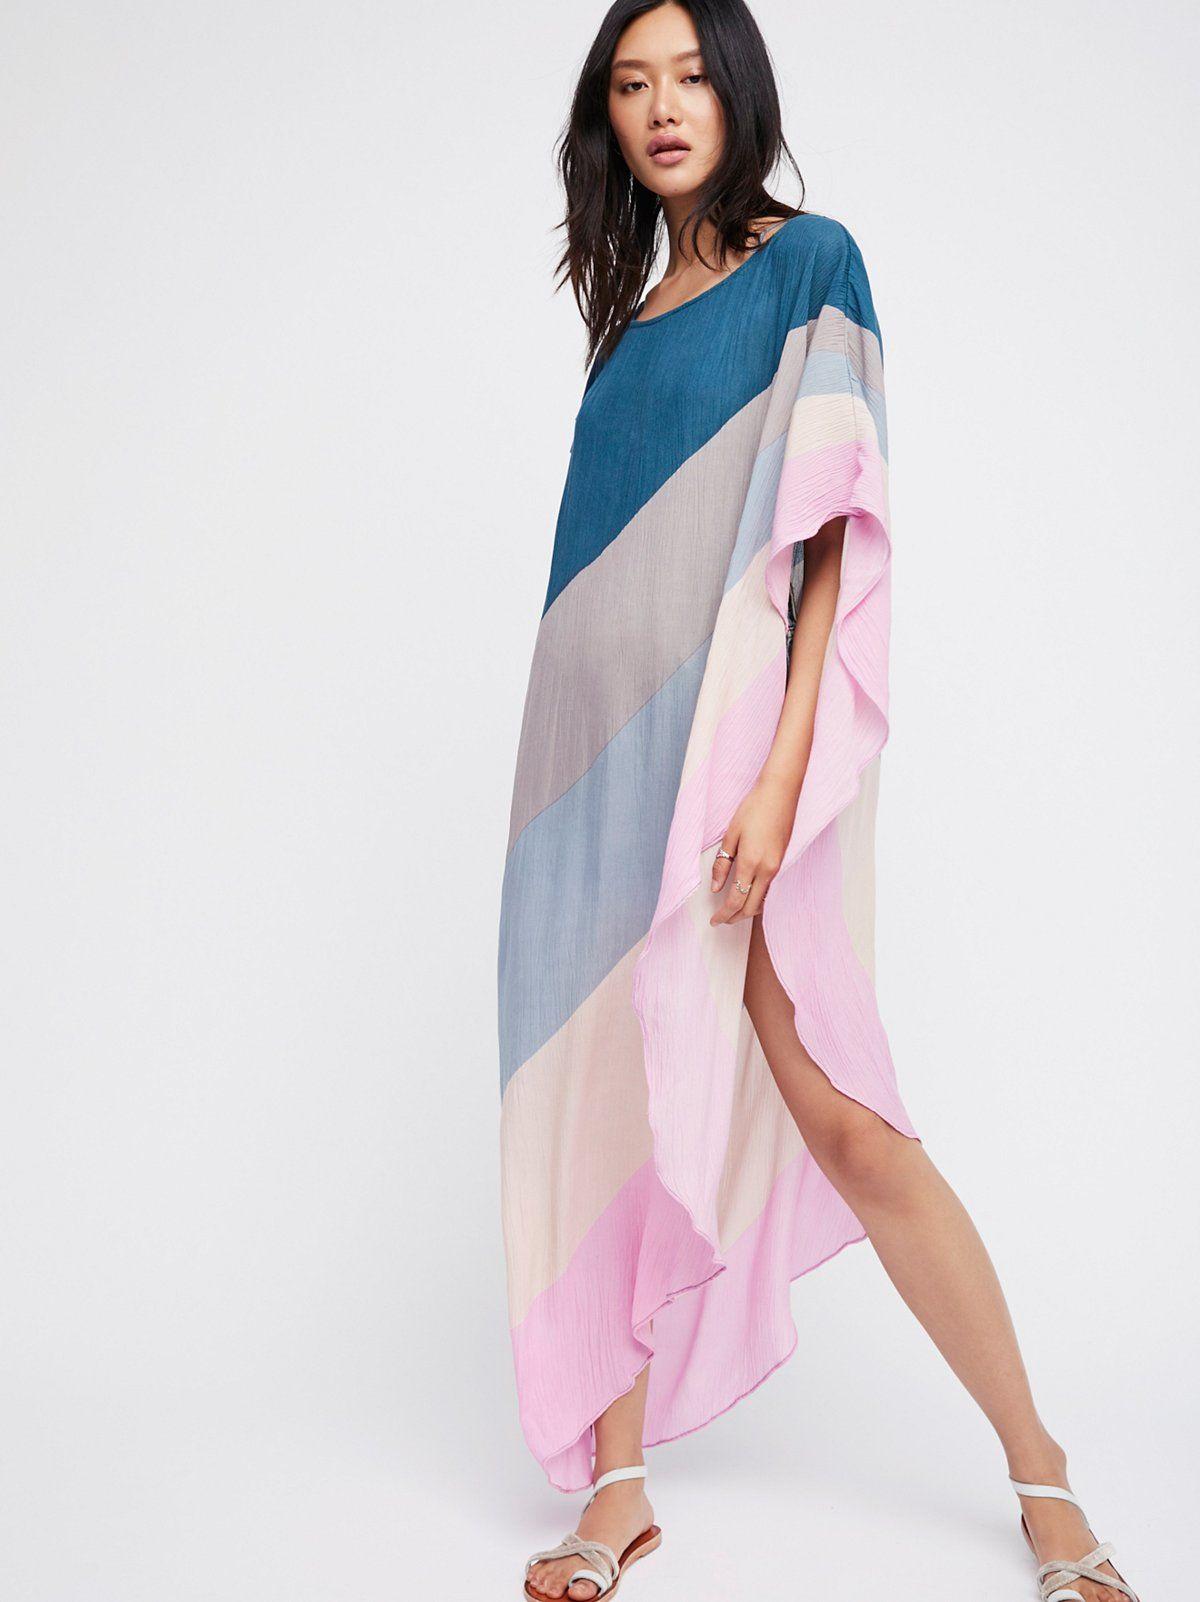 Bra for wedding dress shopping  Neon Rainbow Asymmetrical Kaftan at Free People Clothing Boutique